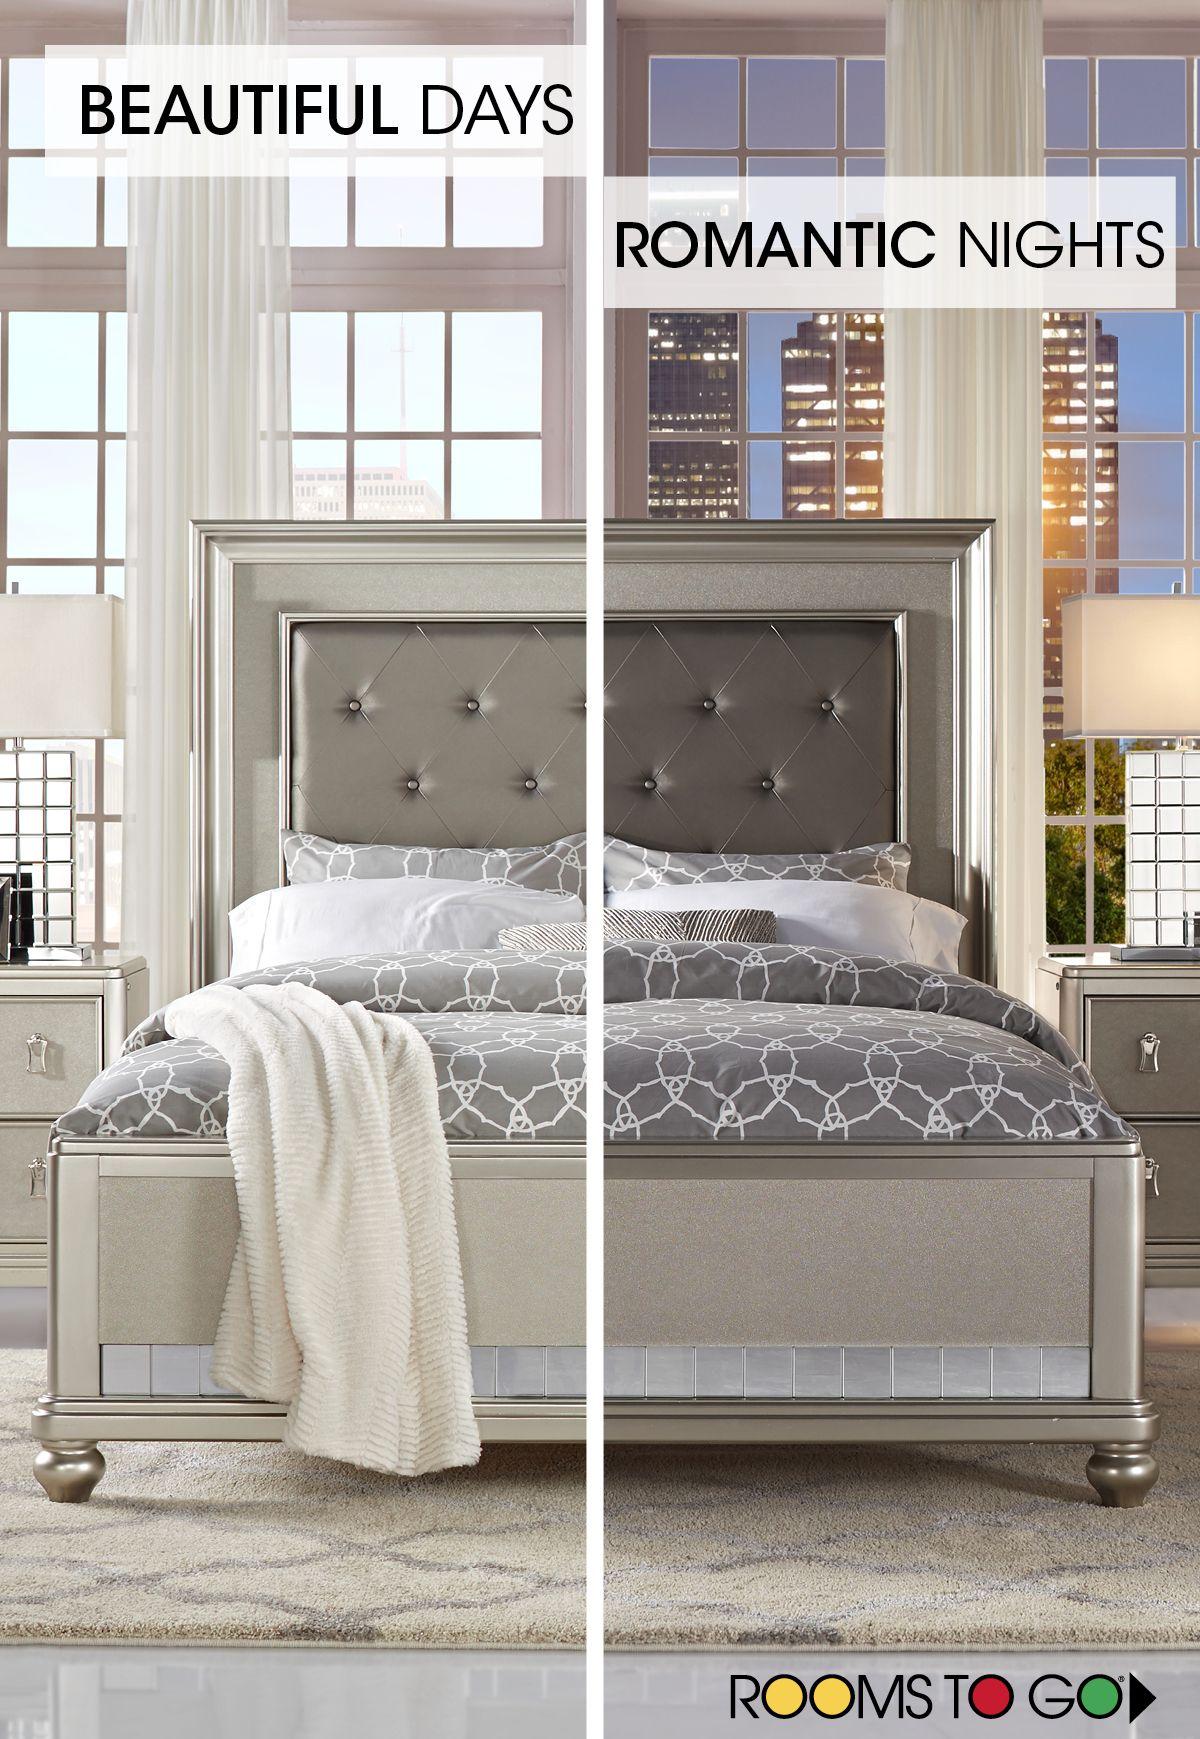 Sofia Vergara Paris Silver 5 Pc Queen Bedroom Bedroom Sets Queen